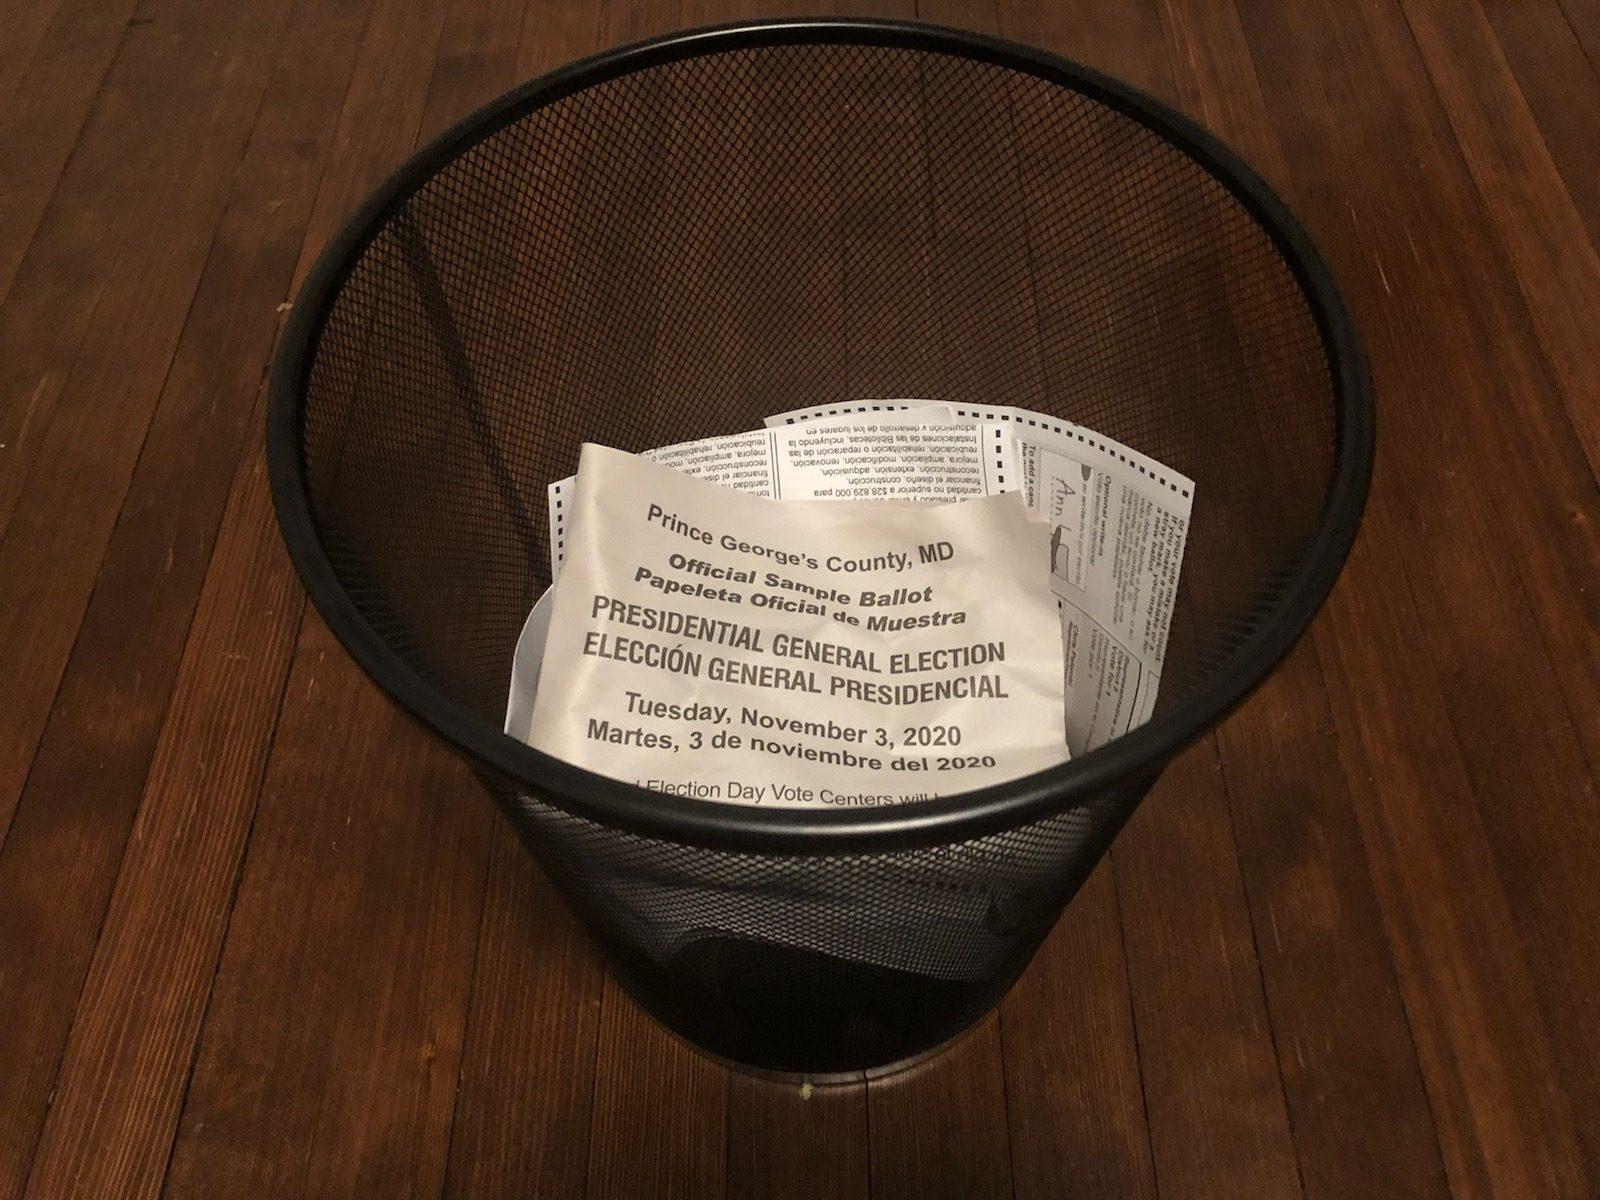 Ballot in a wastebasket